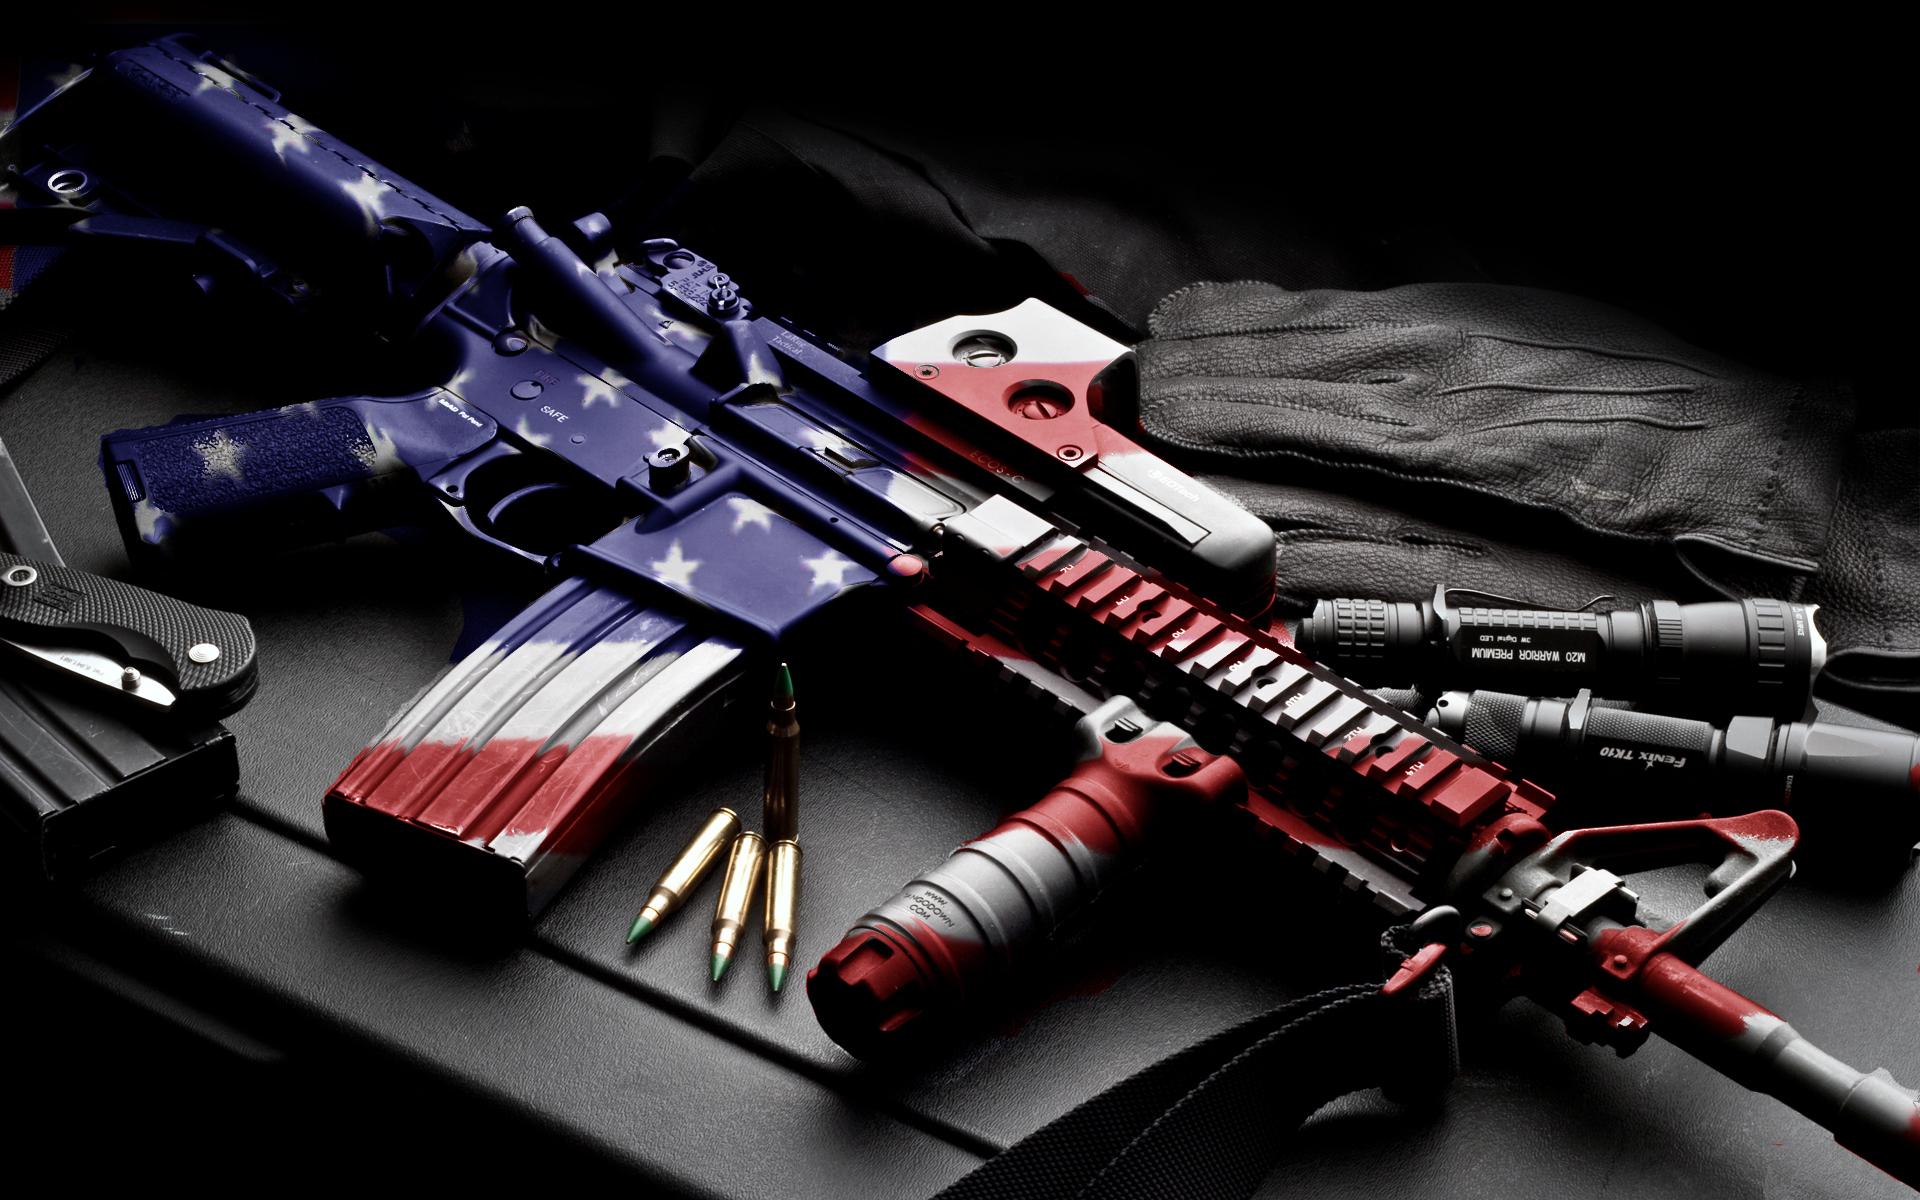 usa america guns mech machine bullet ammo ammuntion flag wallpaper 1920x1200